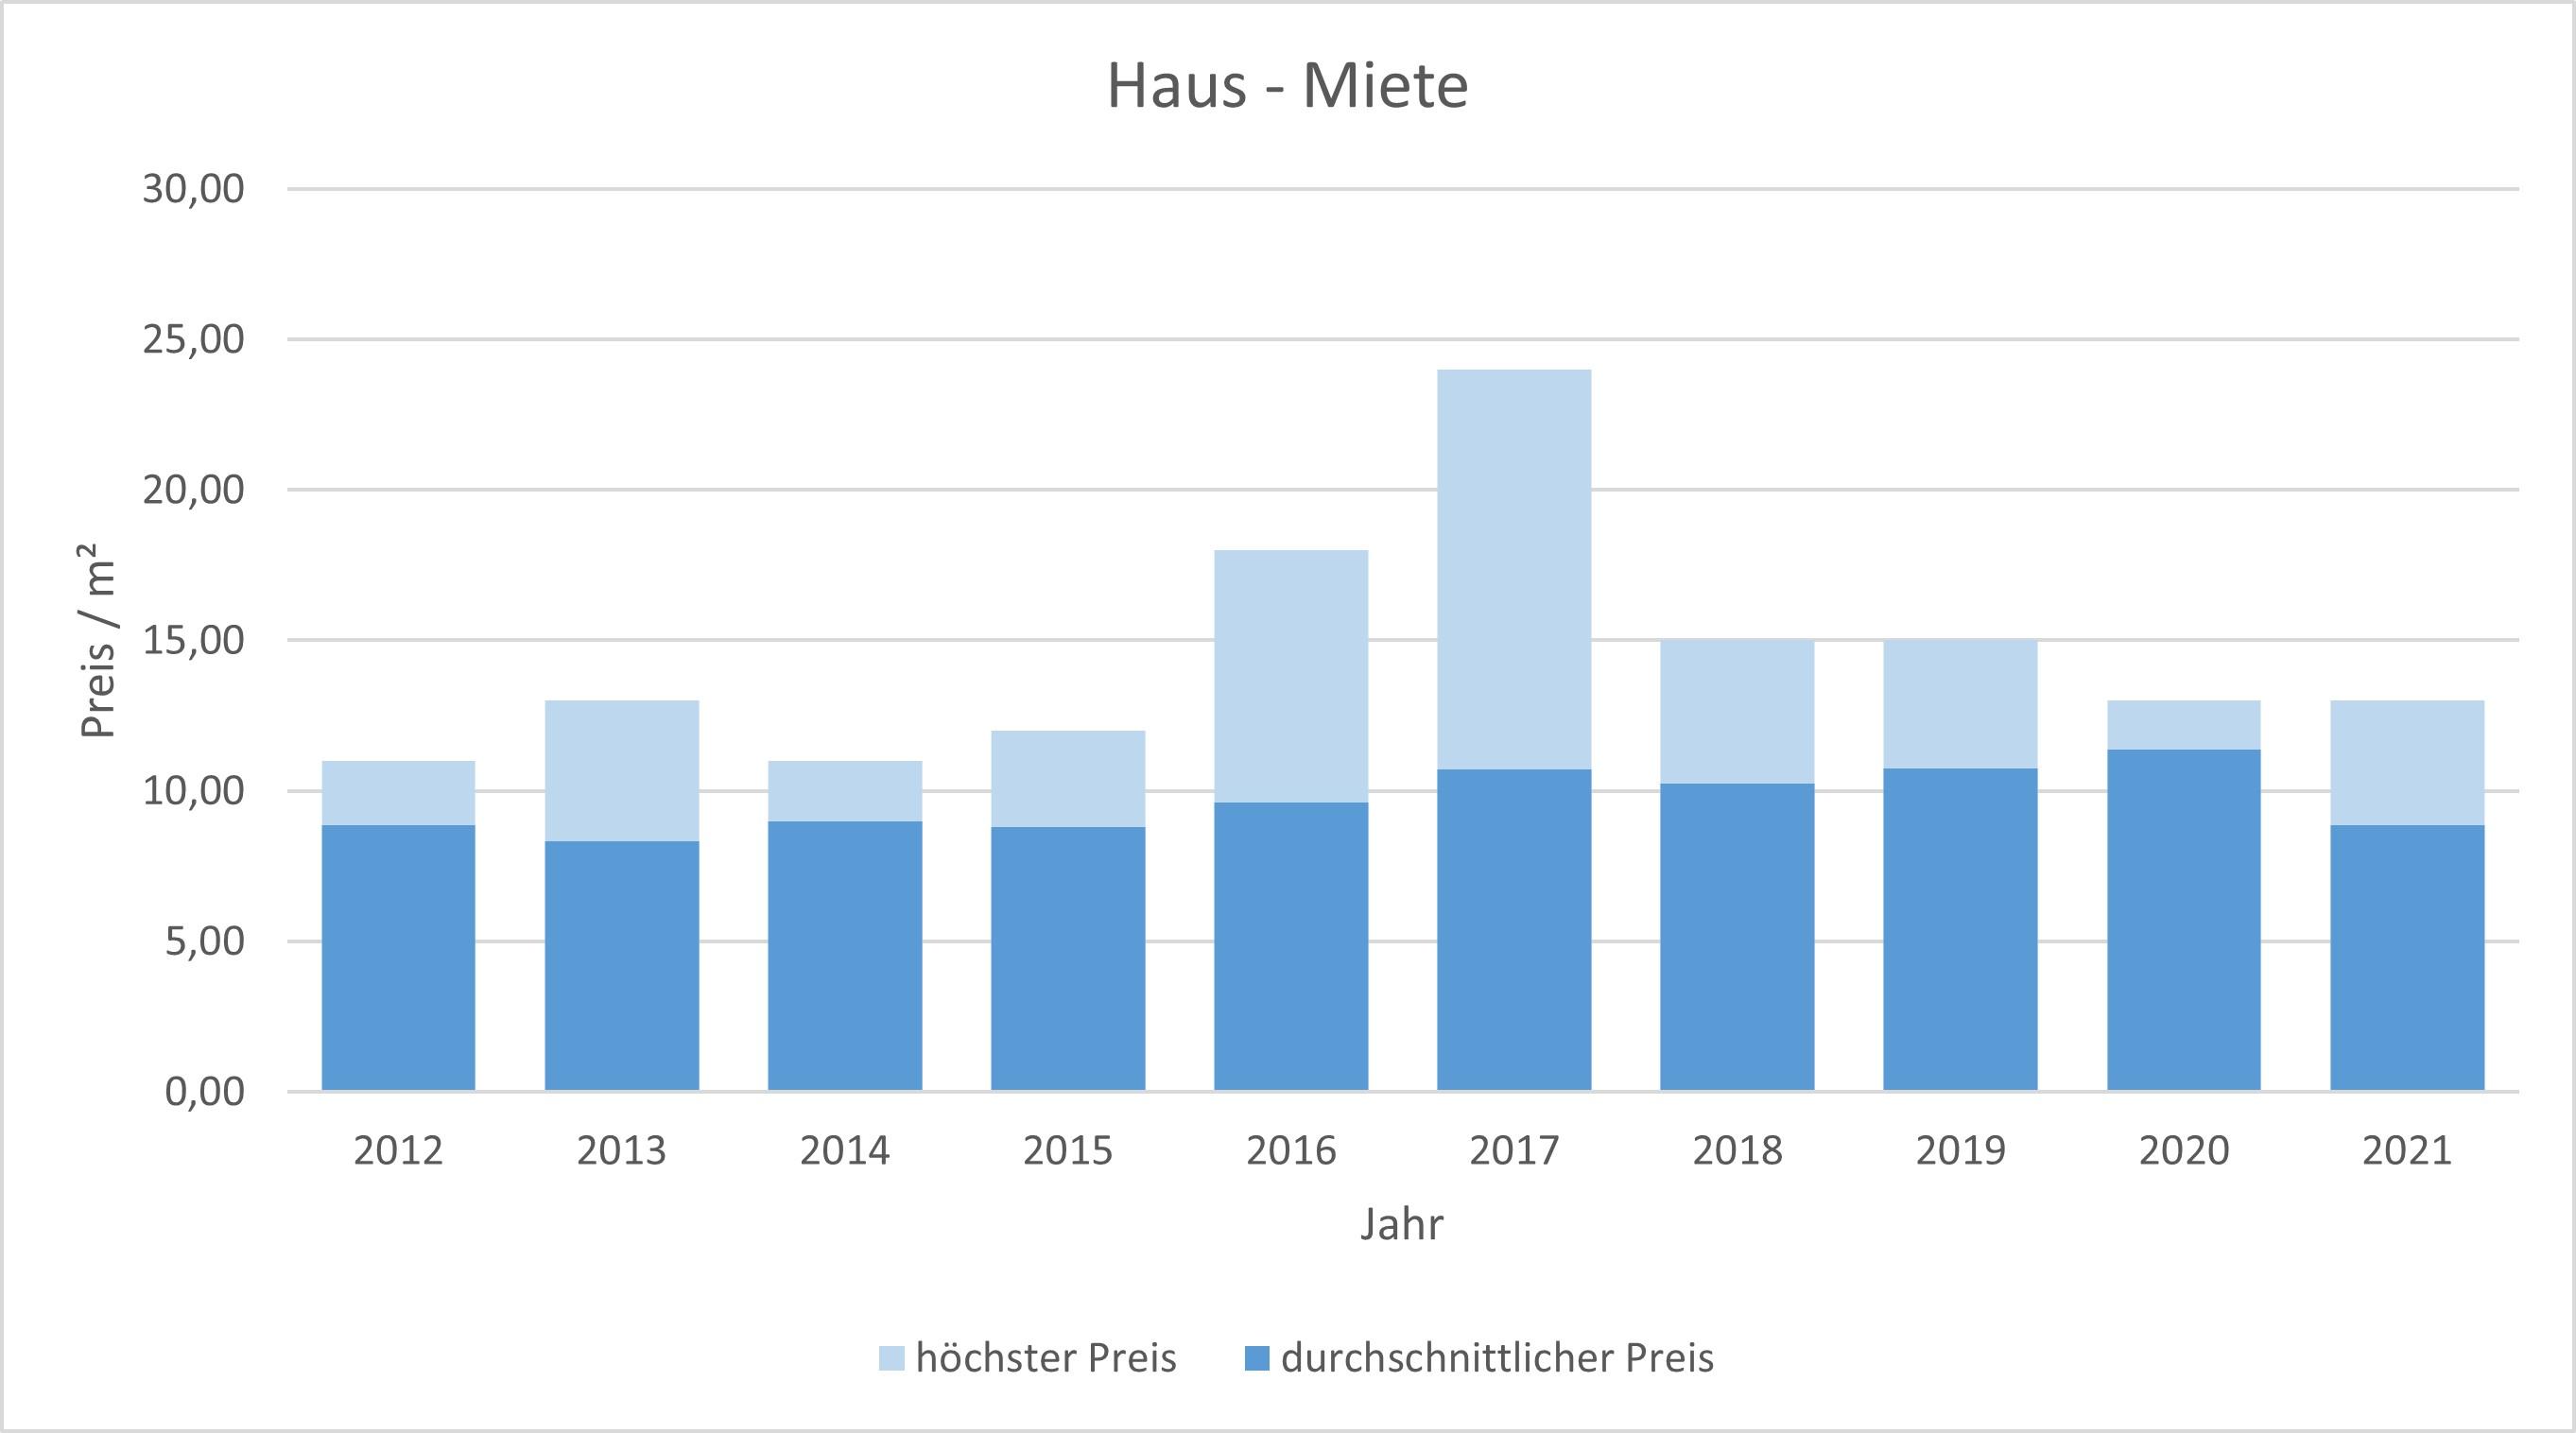 Feldkirchen-Westerham Haus mieten vermieten Preis  2019 2020 2021 Bewertung Makler www.happy-immo.de